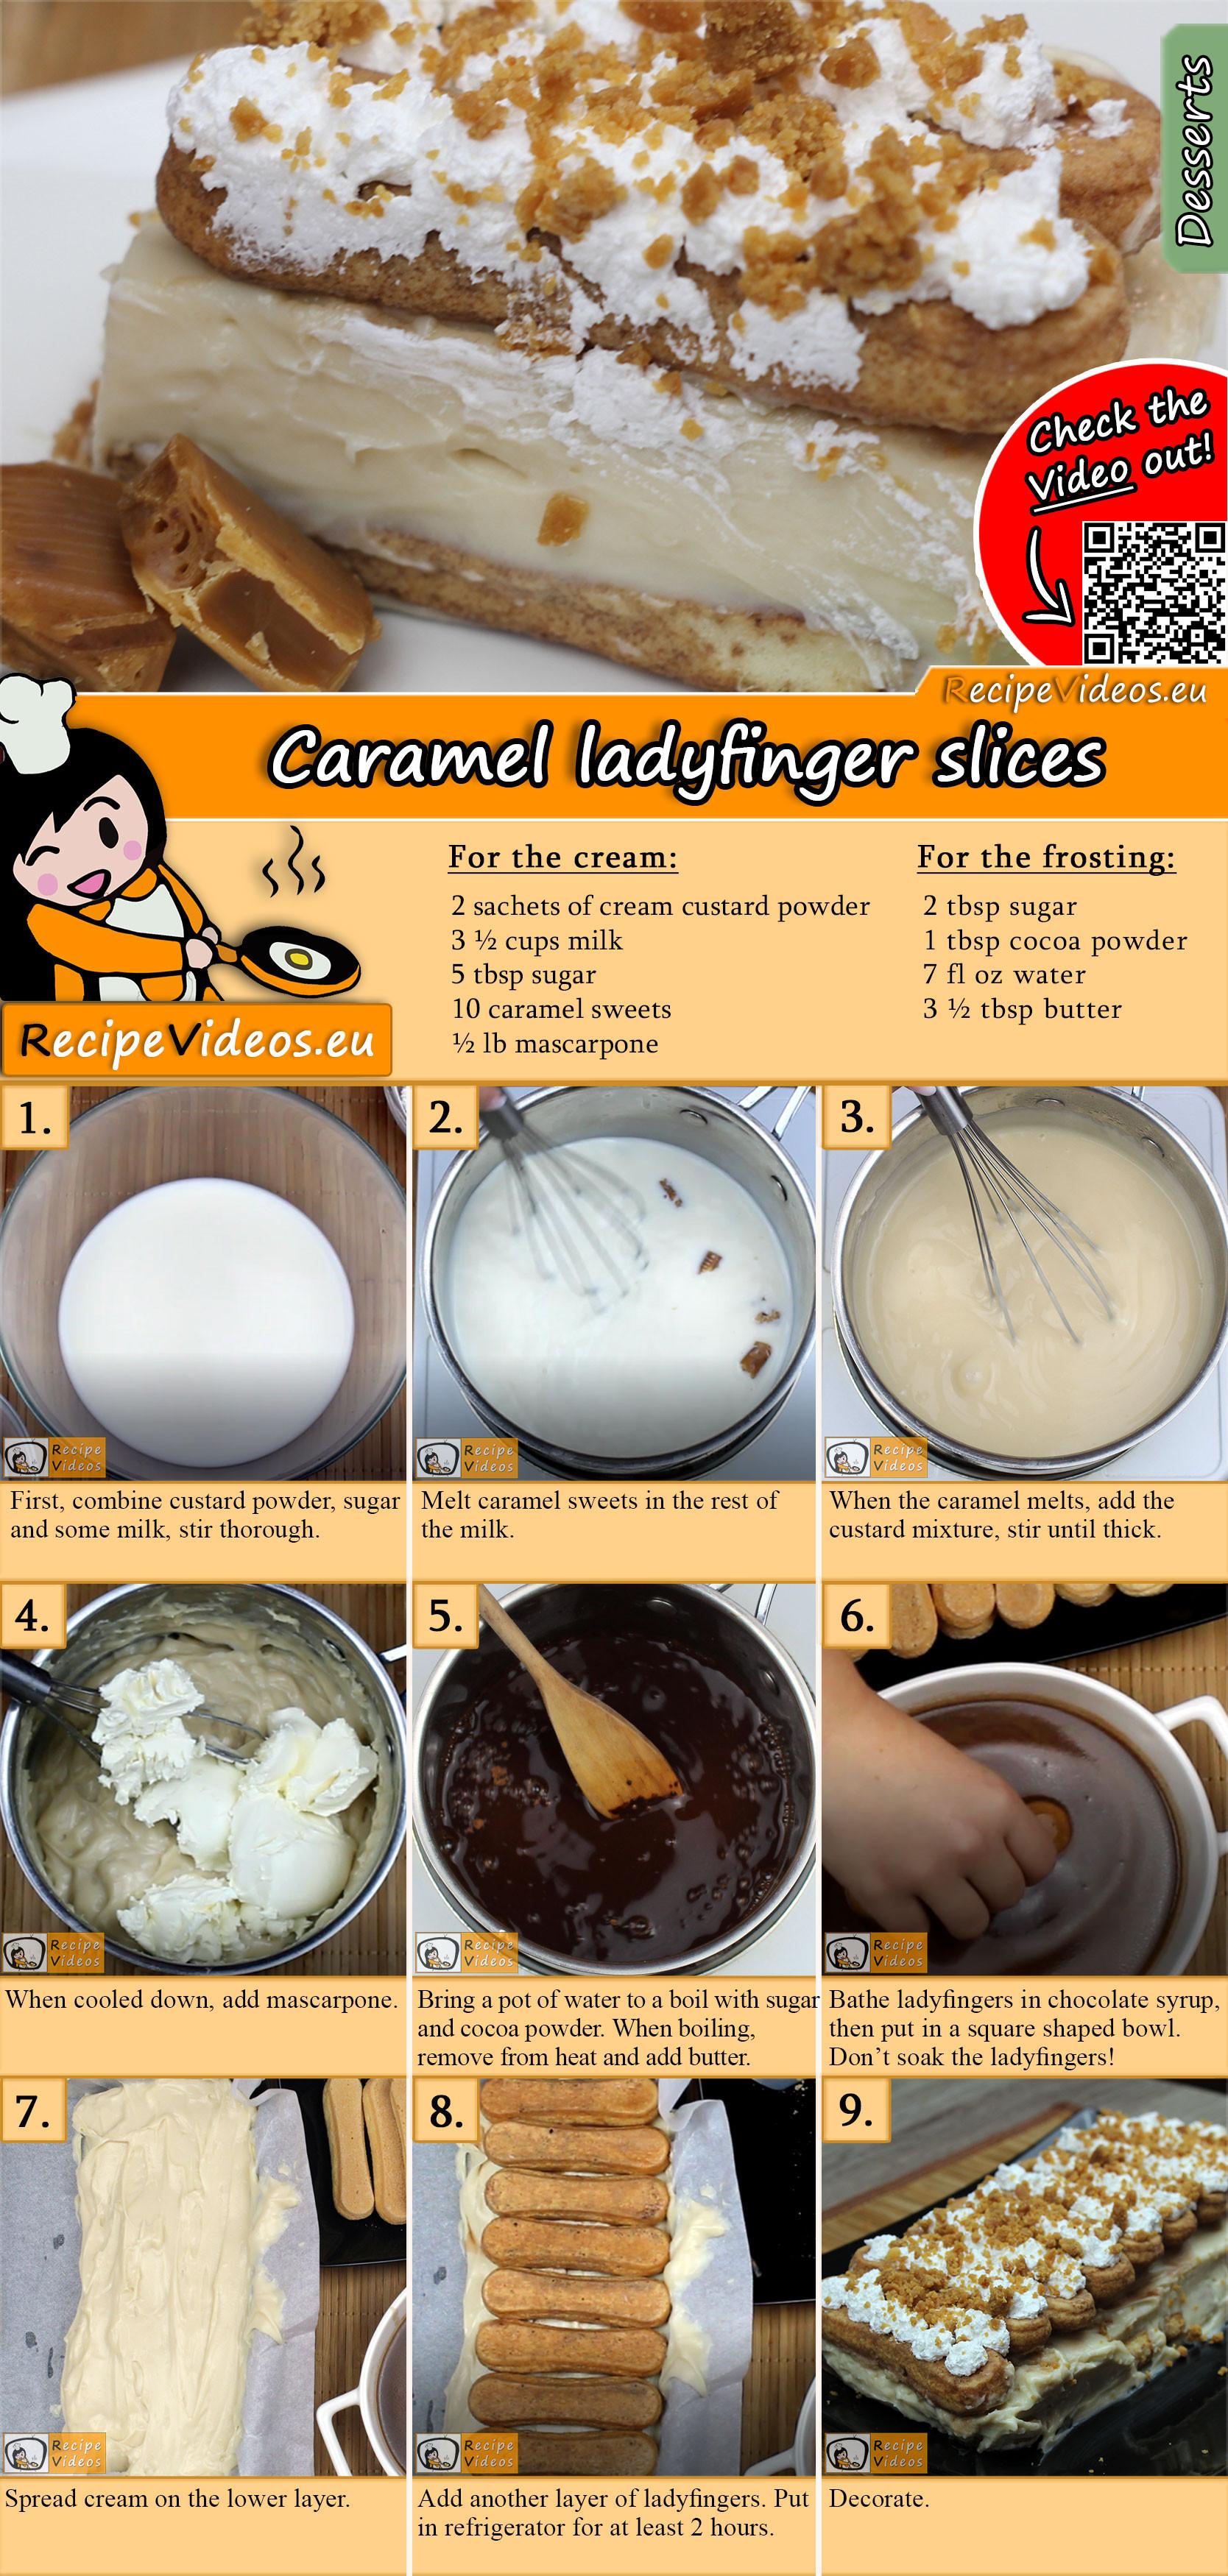 Caramel ladyfinger slices recipe with video